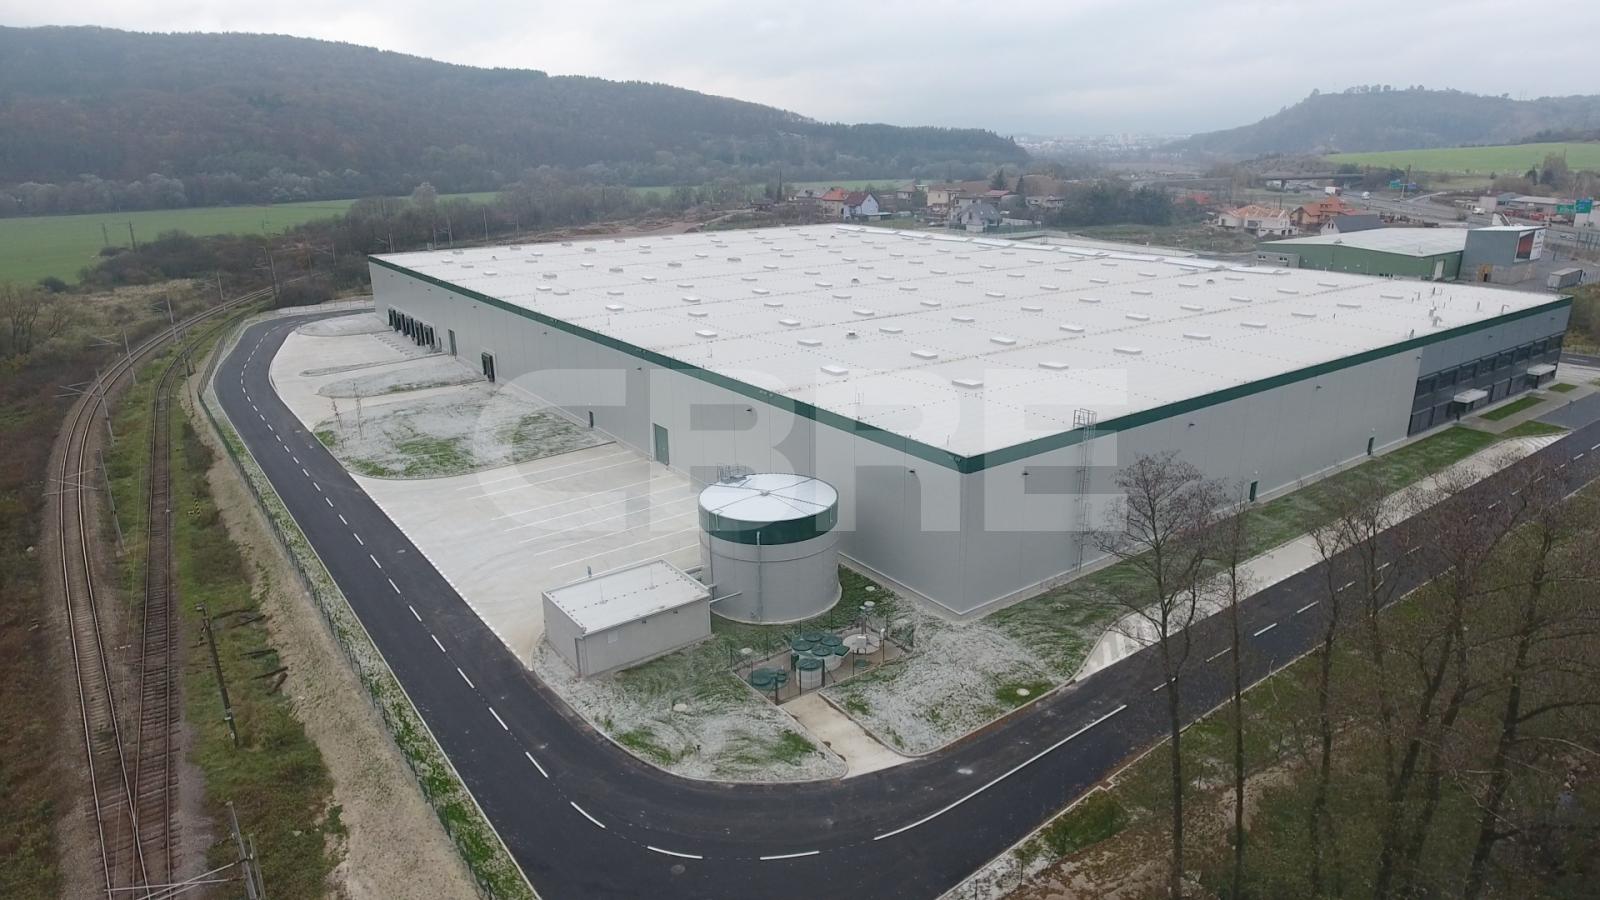 Prologis Park Ziar nad Hronom, Banská Bystrica Region, Žiar nad Hronom | Warehouses for rent or sale by CBRE | 1